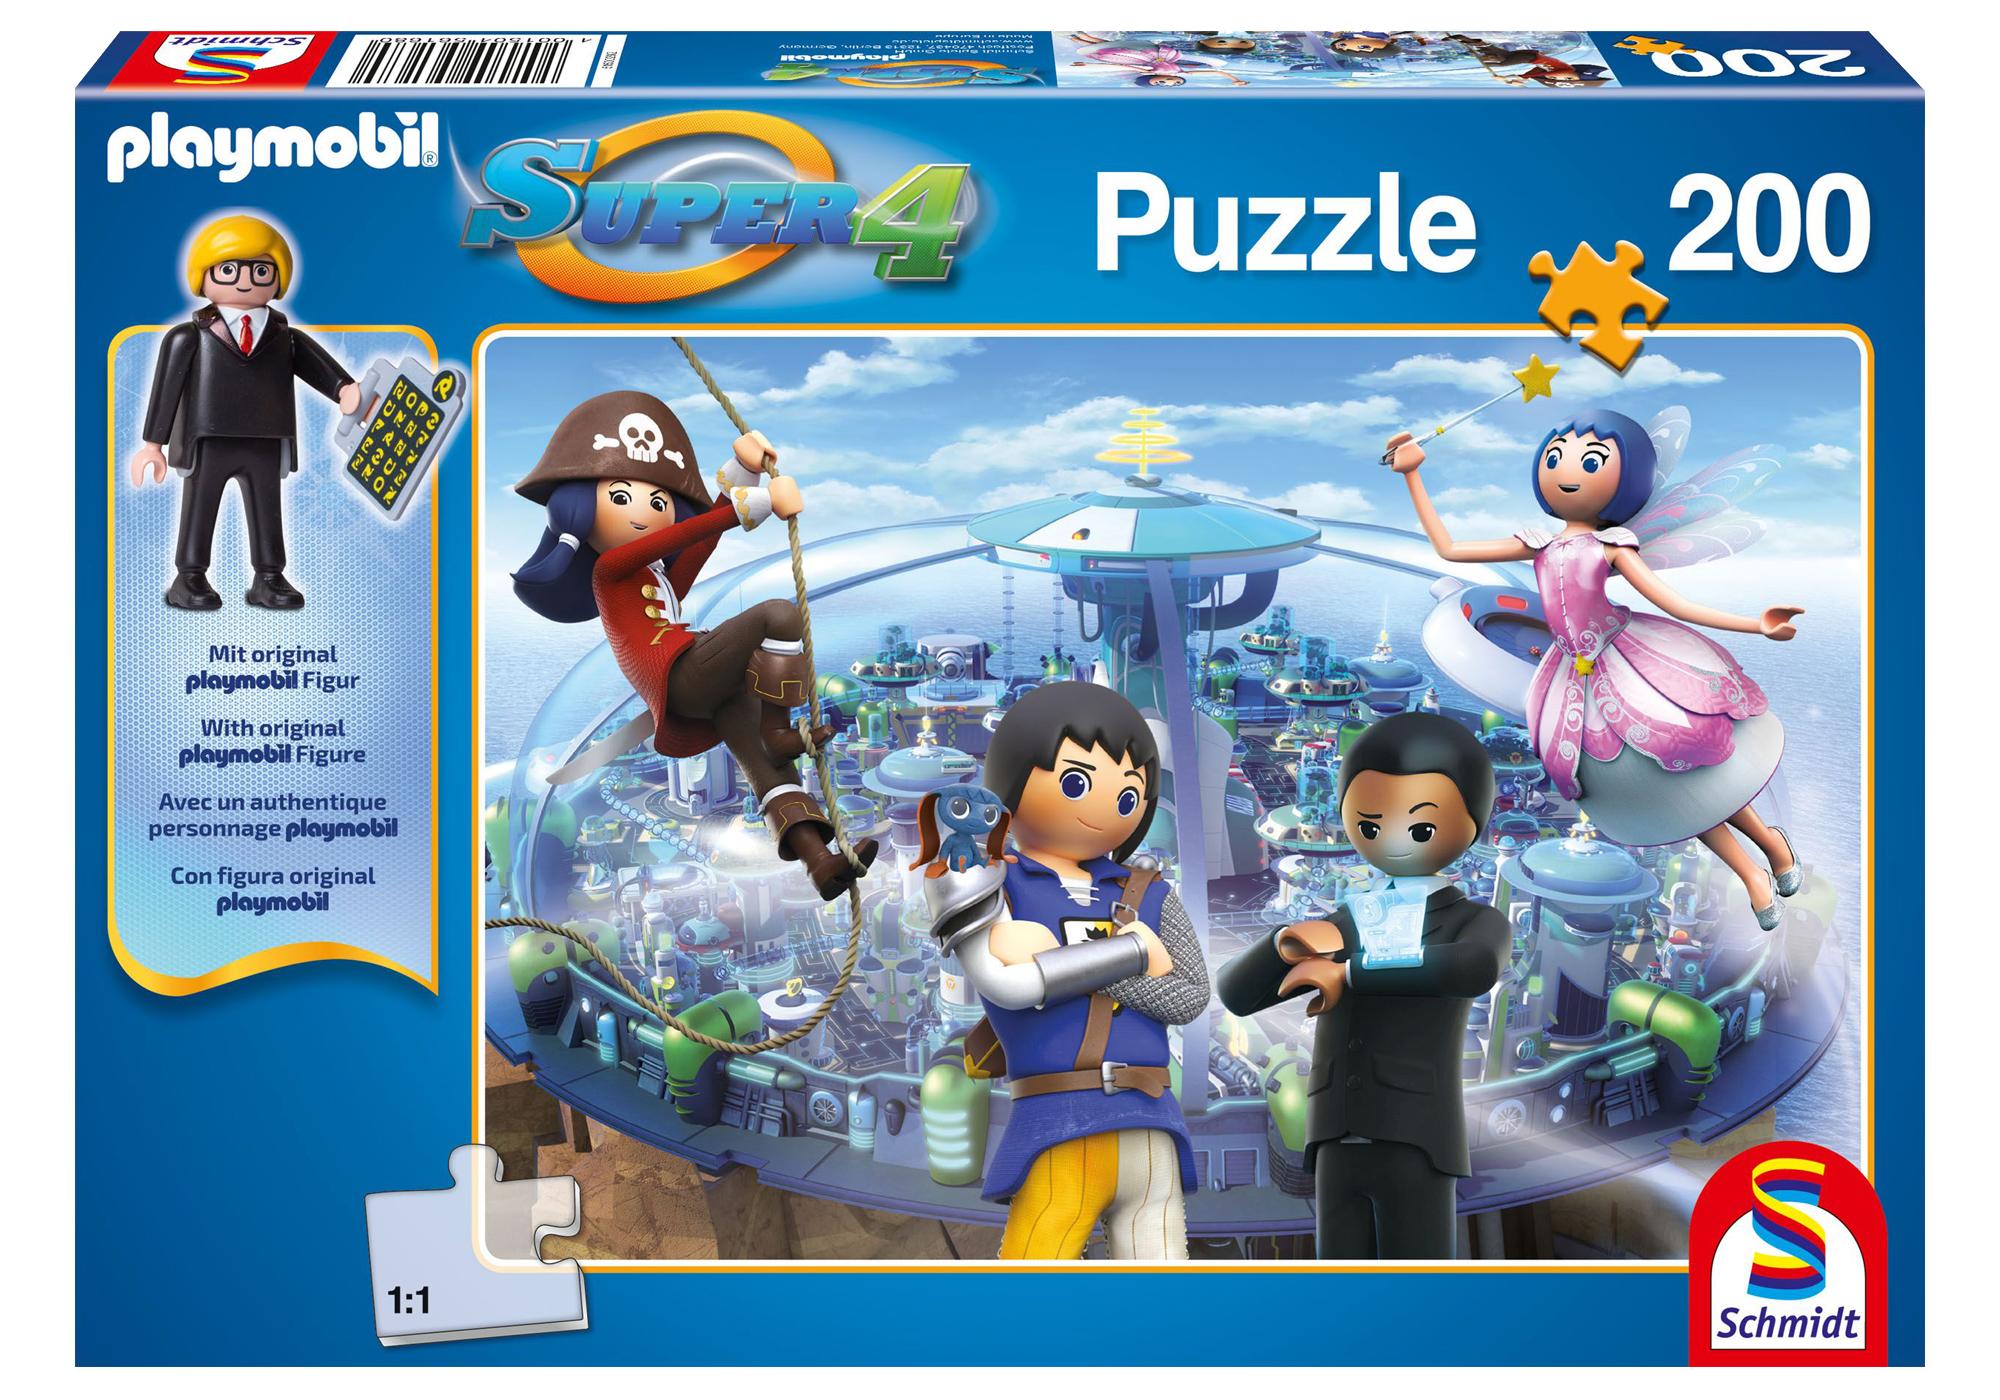 http://media.playmobil.com/i/playmobil/80709_product_detail